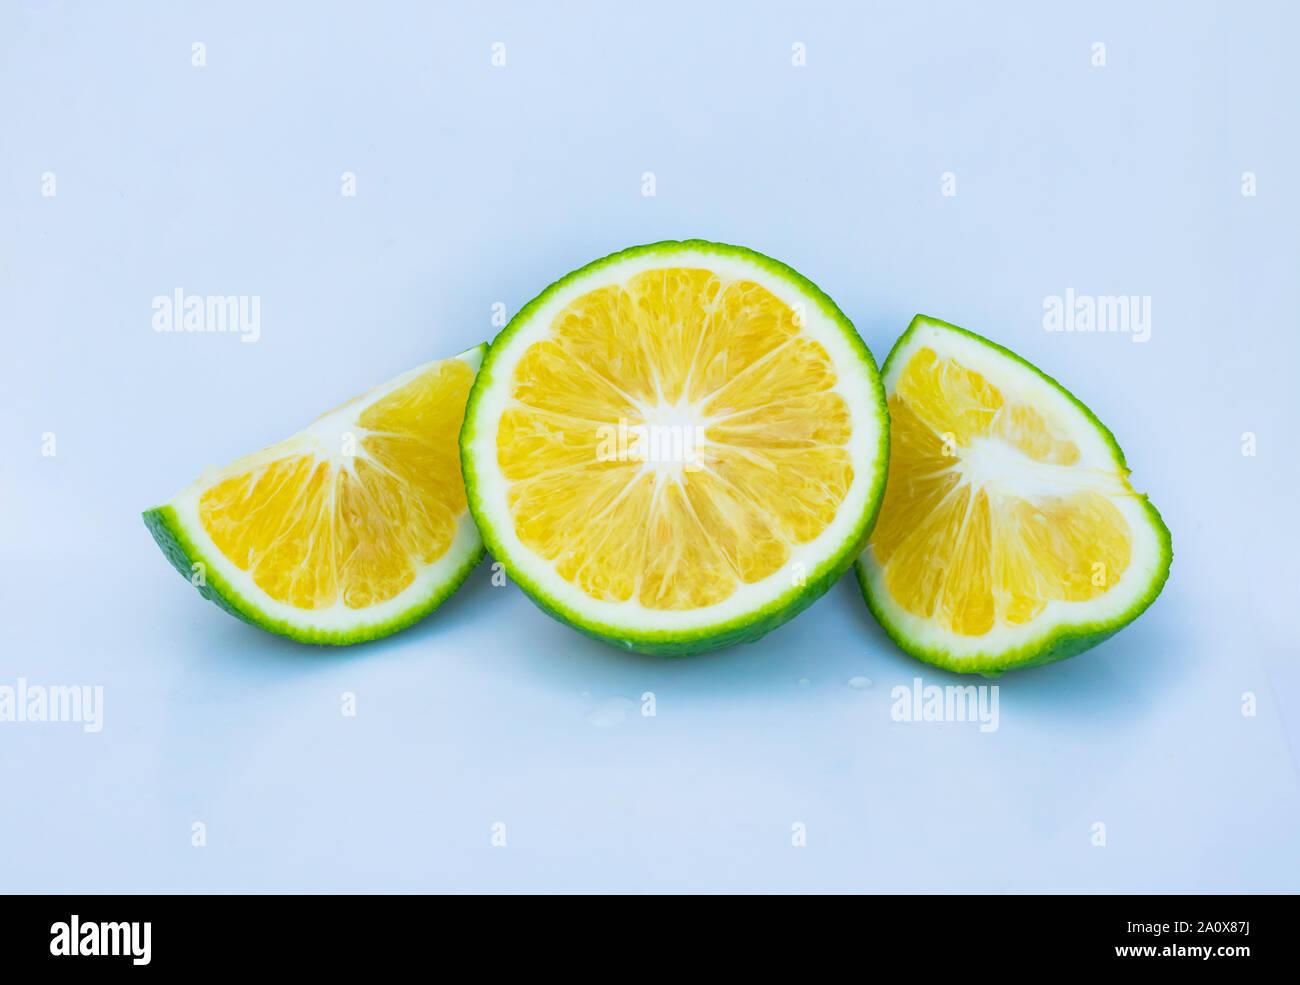 close up of green orange slices isolated on white background. Stock Photo